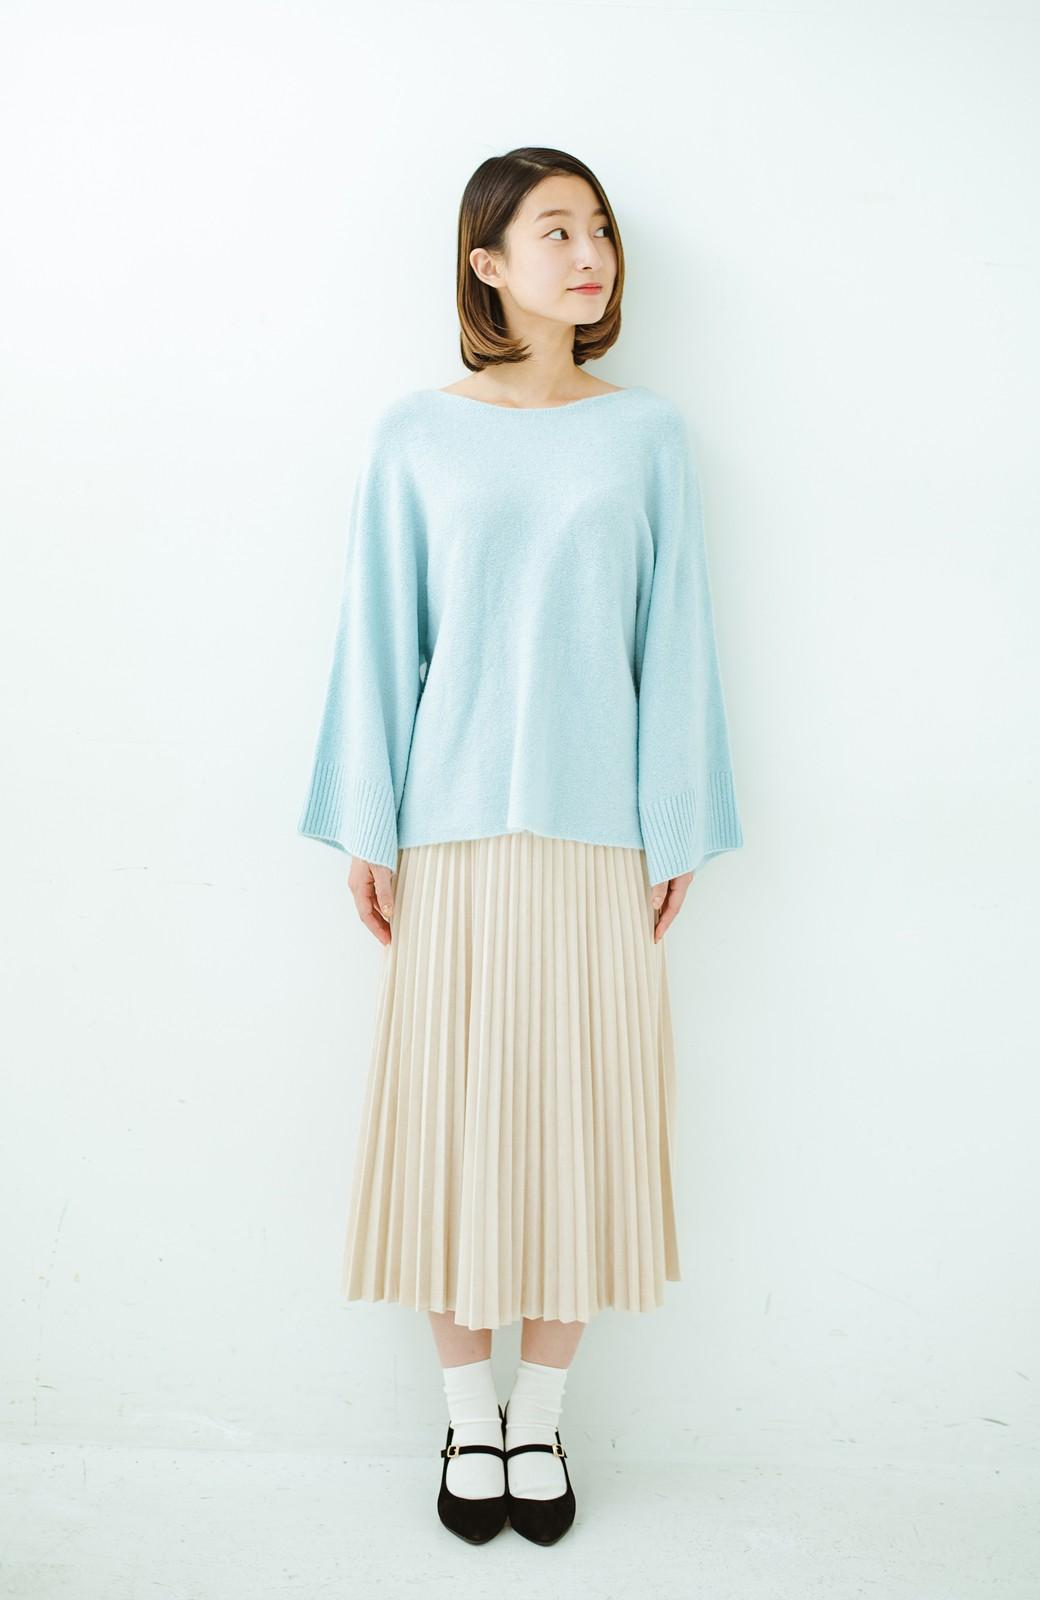 haco! 太め袖がかわいい横編みプルオーバーニット <ライトブルー>の商品写真8